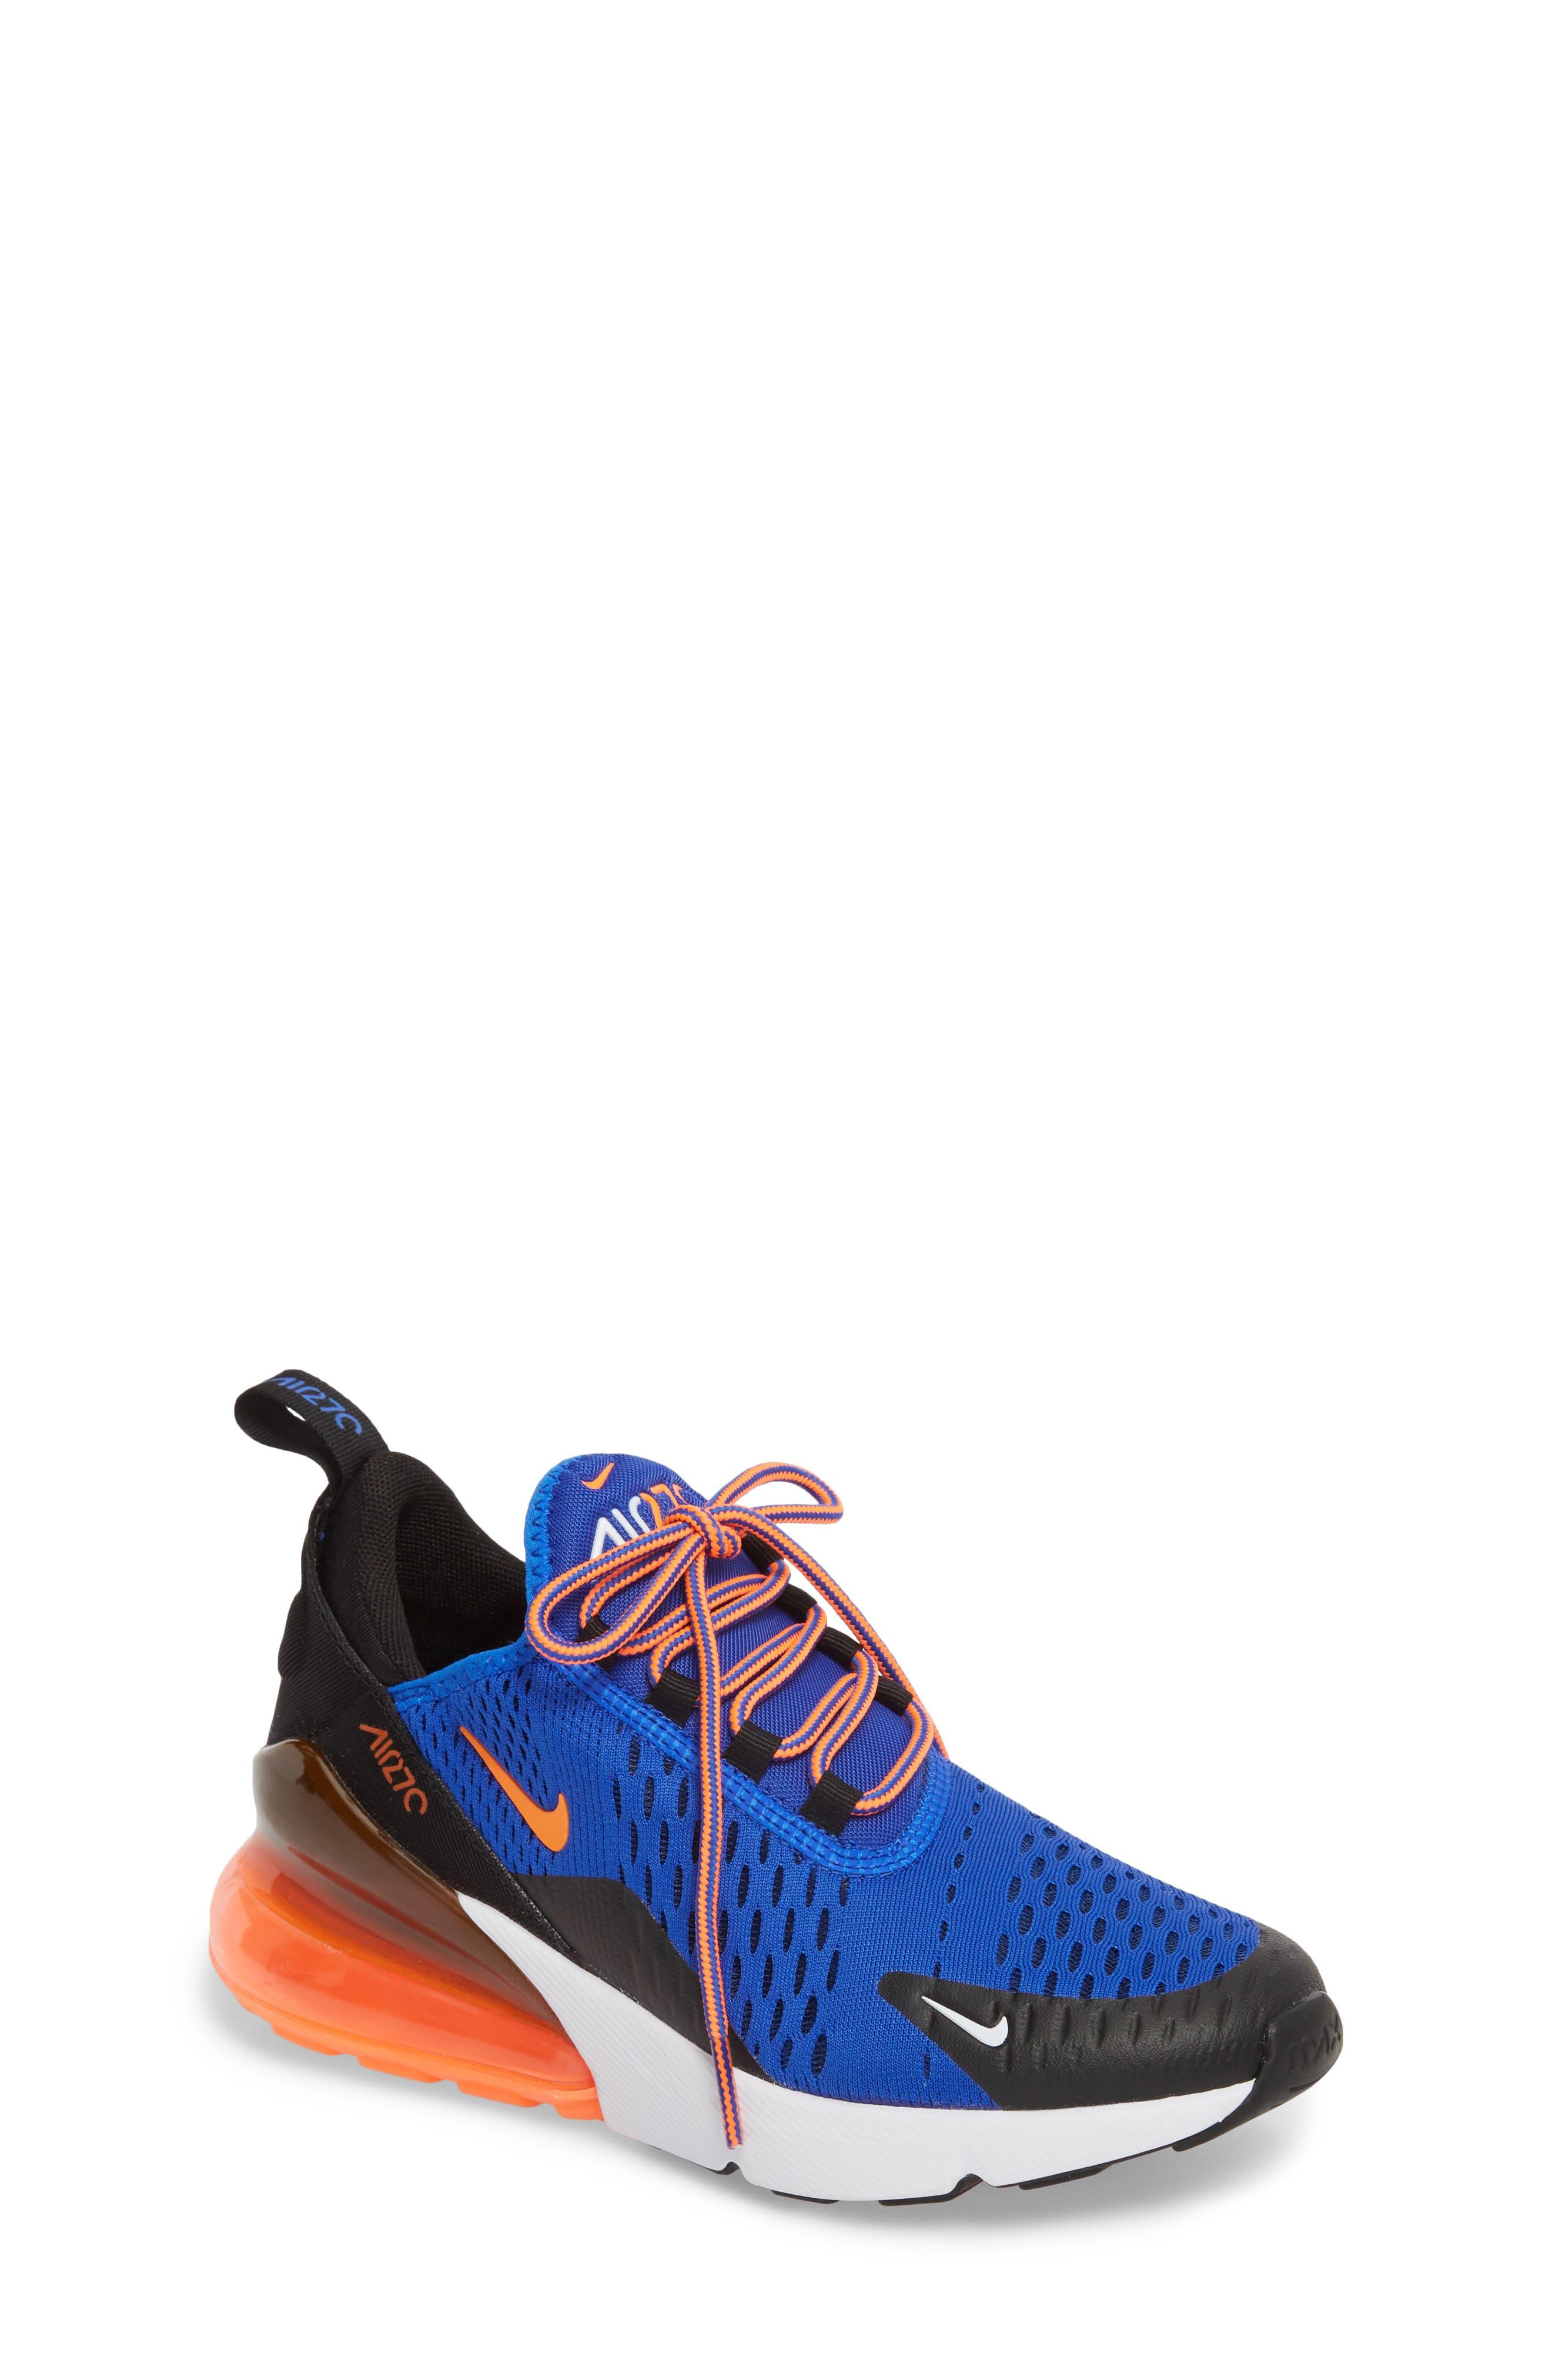 Air Max 270 Sneaker,                         Main,                         color, Racer Blue/ Crimson/ Black